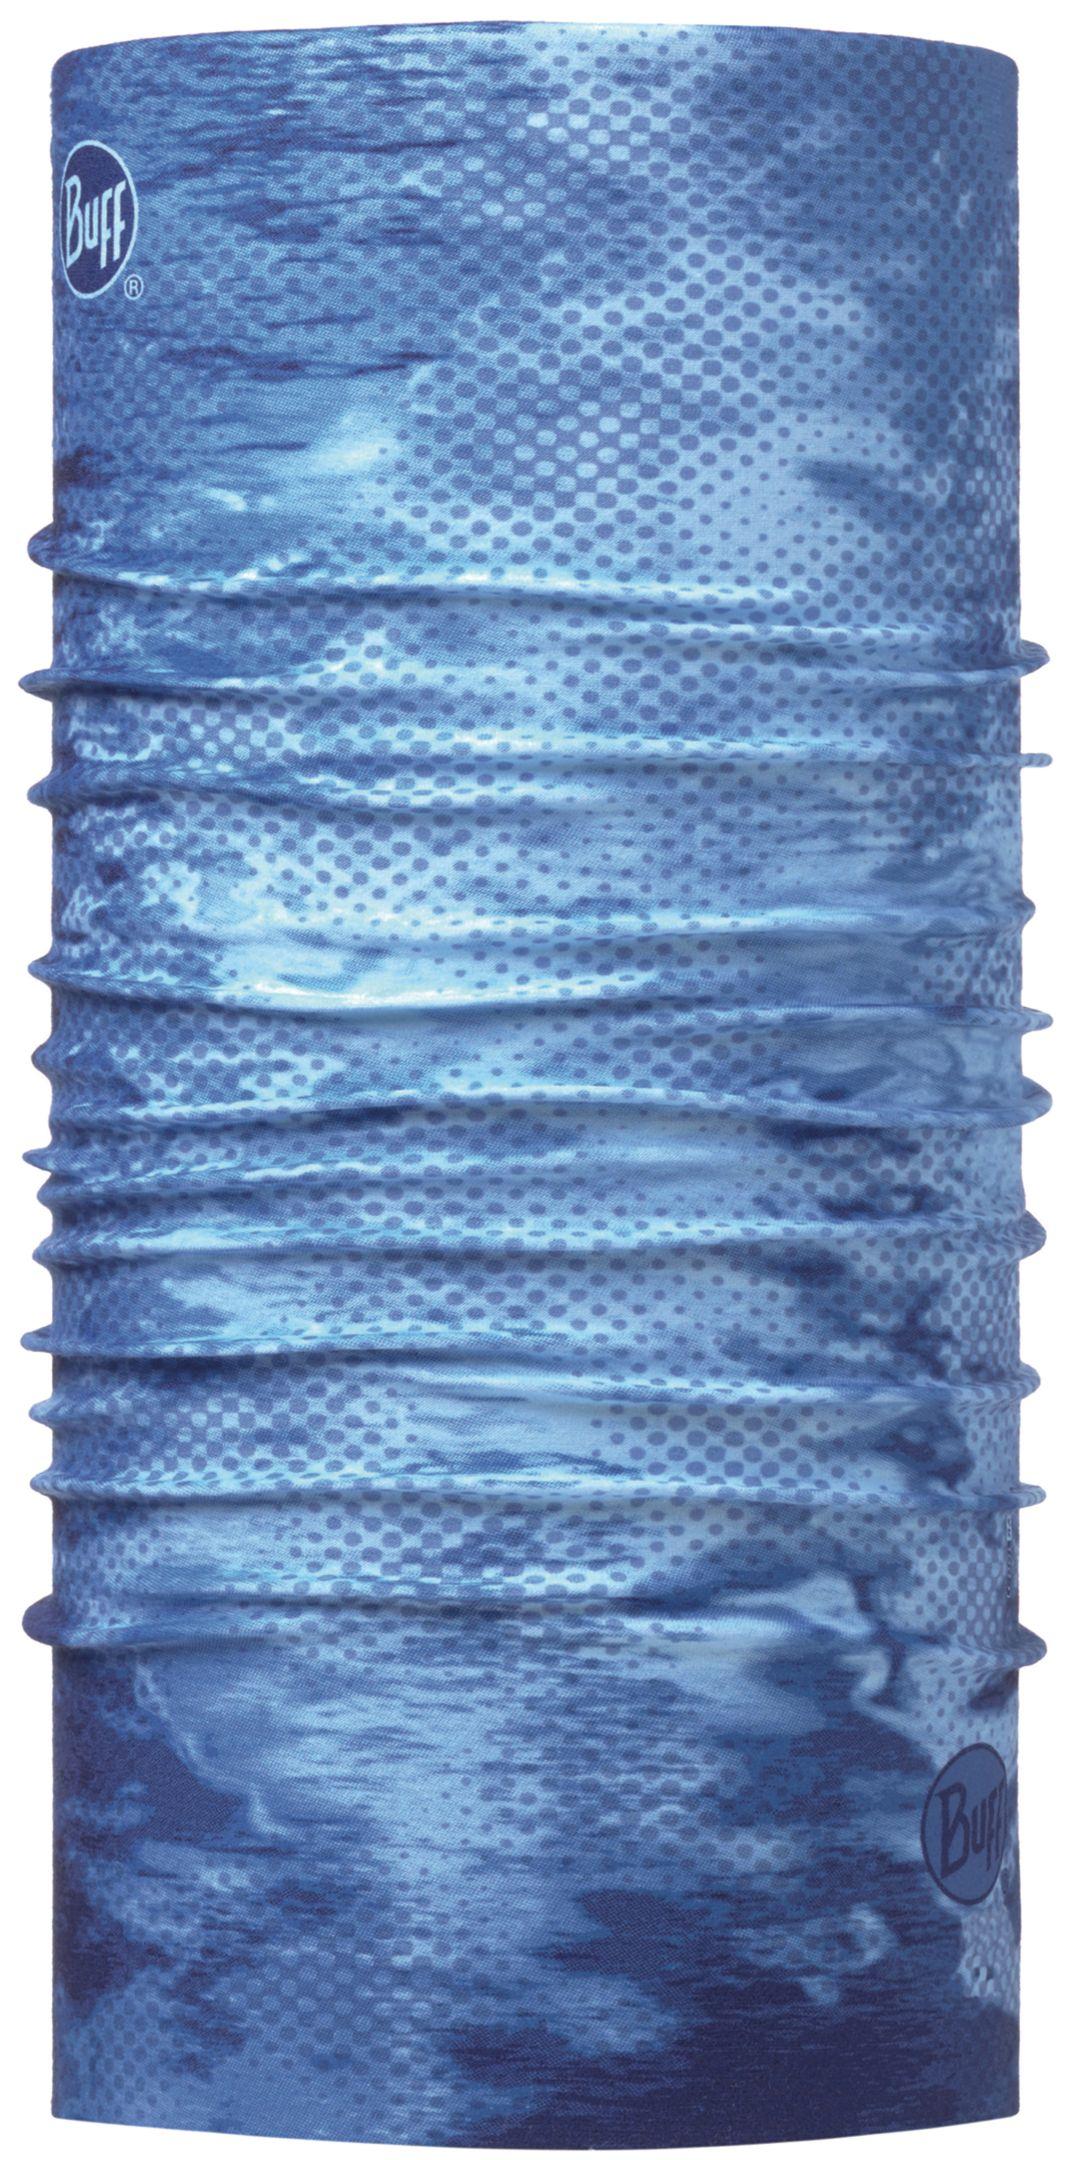 Buff Unisex Coolnet UV Vivid Grey One Size